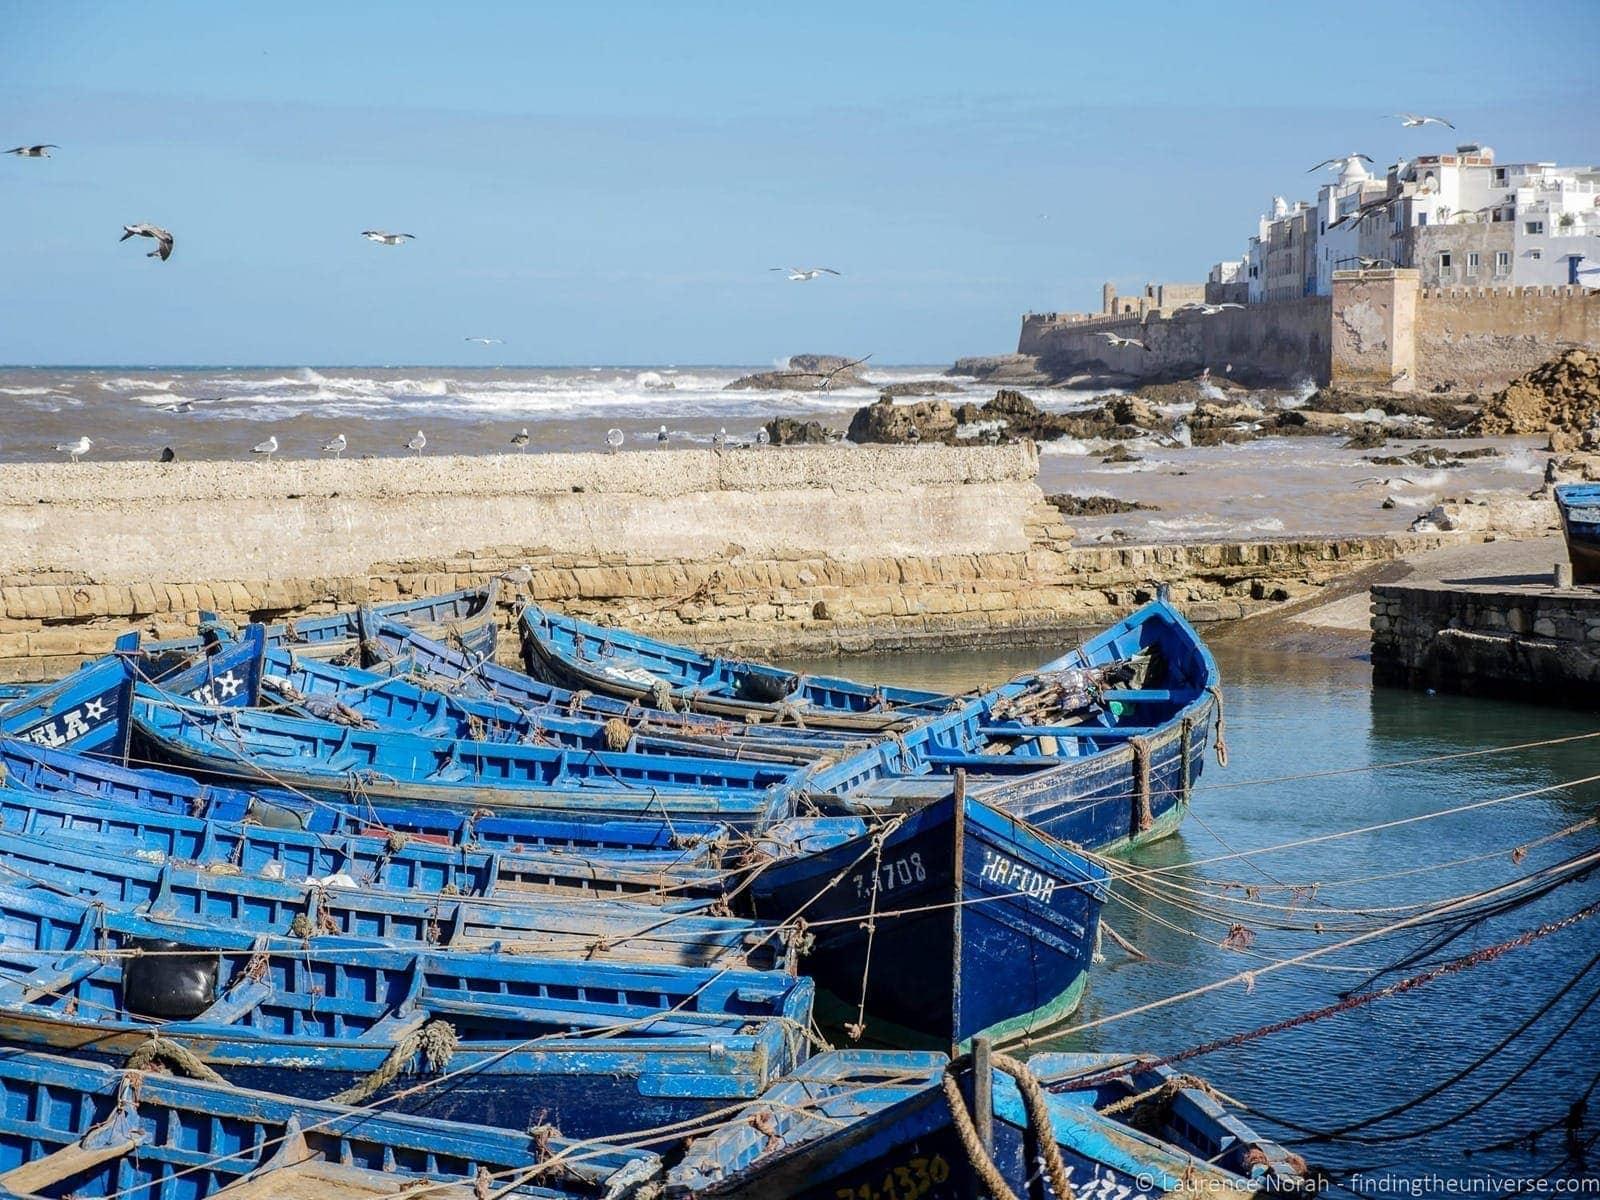 Fishing boats Essaouira game of thrones